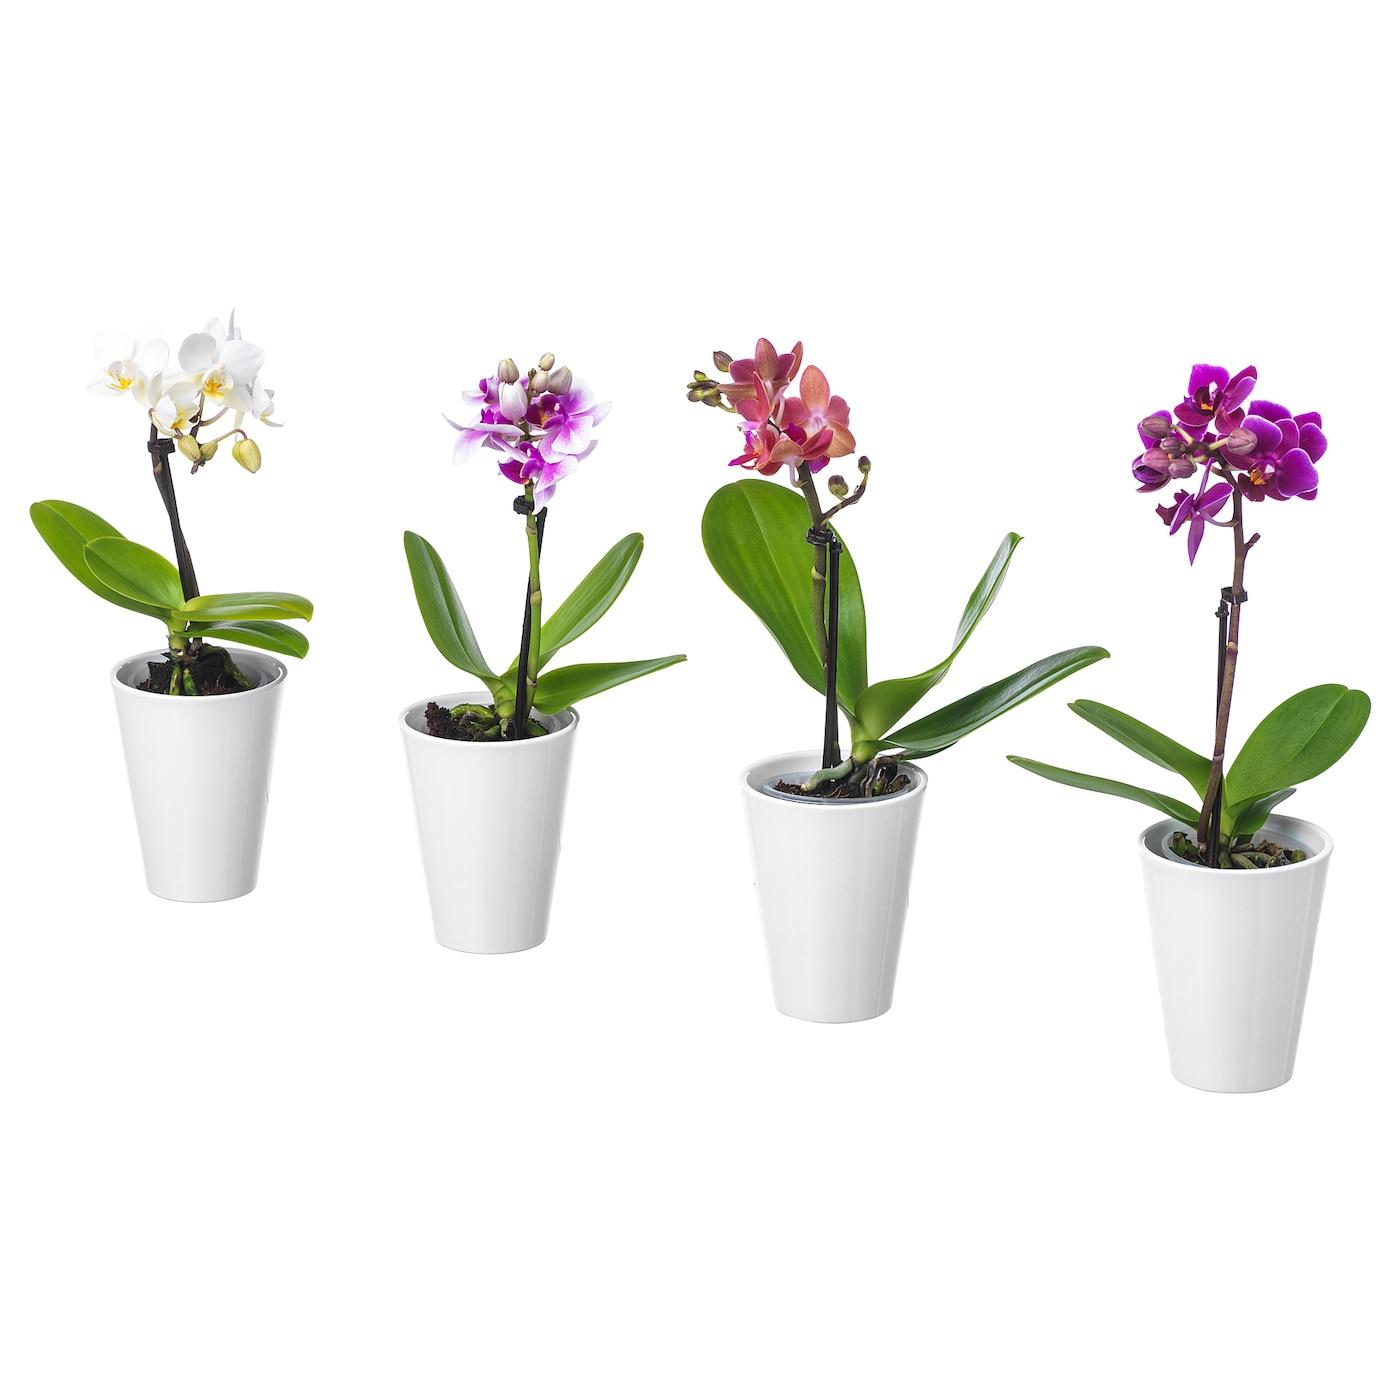 phalaenopsis plante avec vase orchid e coloris assortis 6 cm ikea. Black Bedroom Furniture Sets. Home Design Ideas